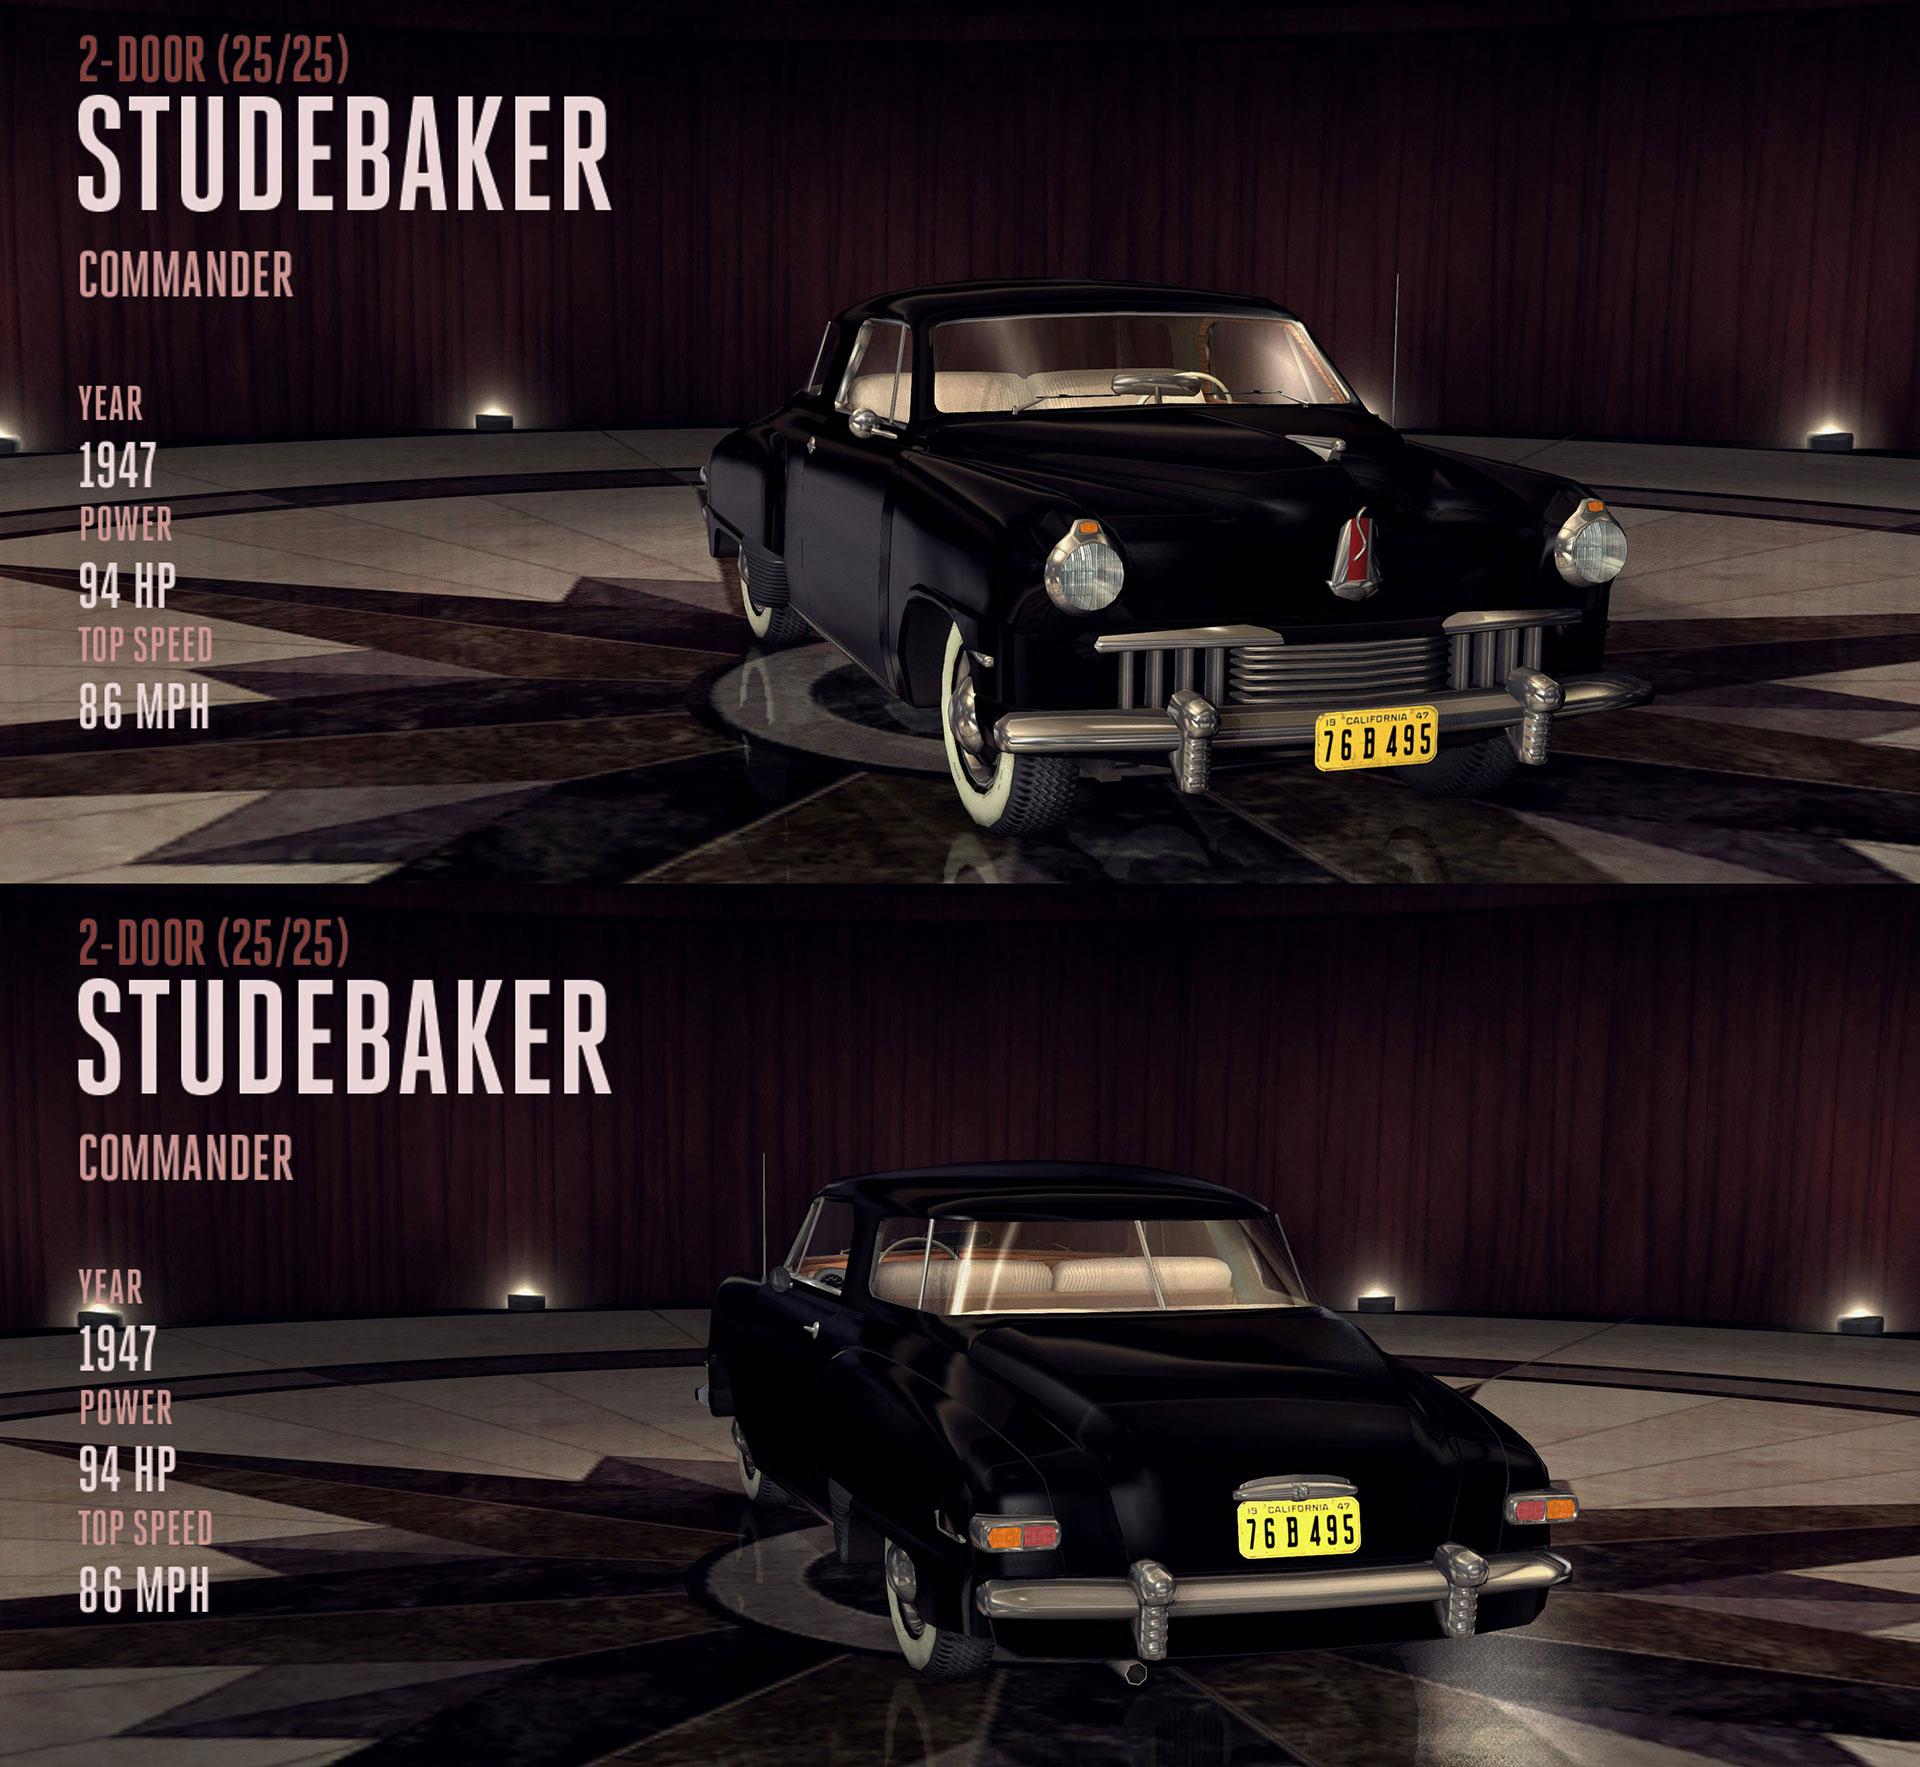 Archivo:1947-studebaker-commander2.jpg